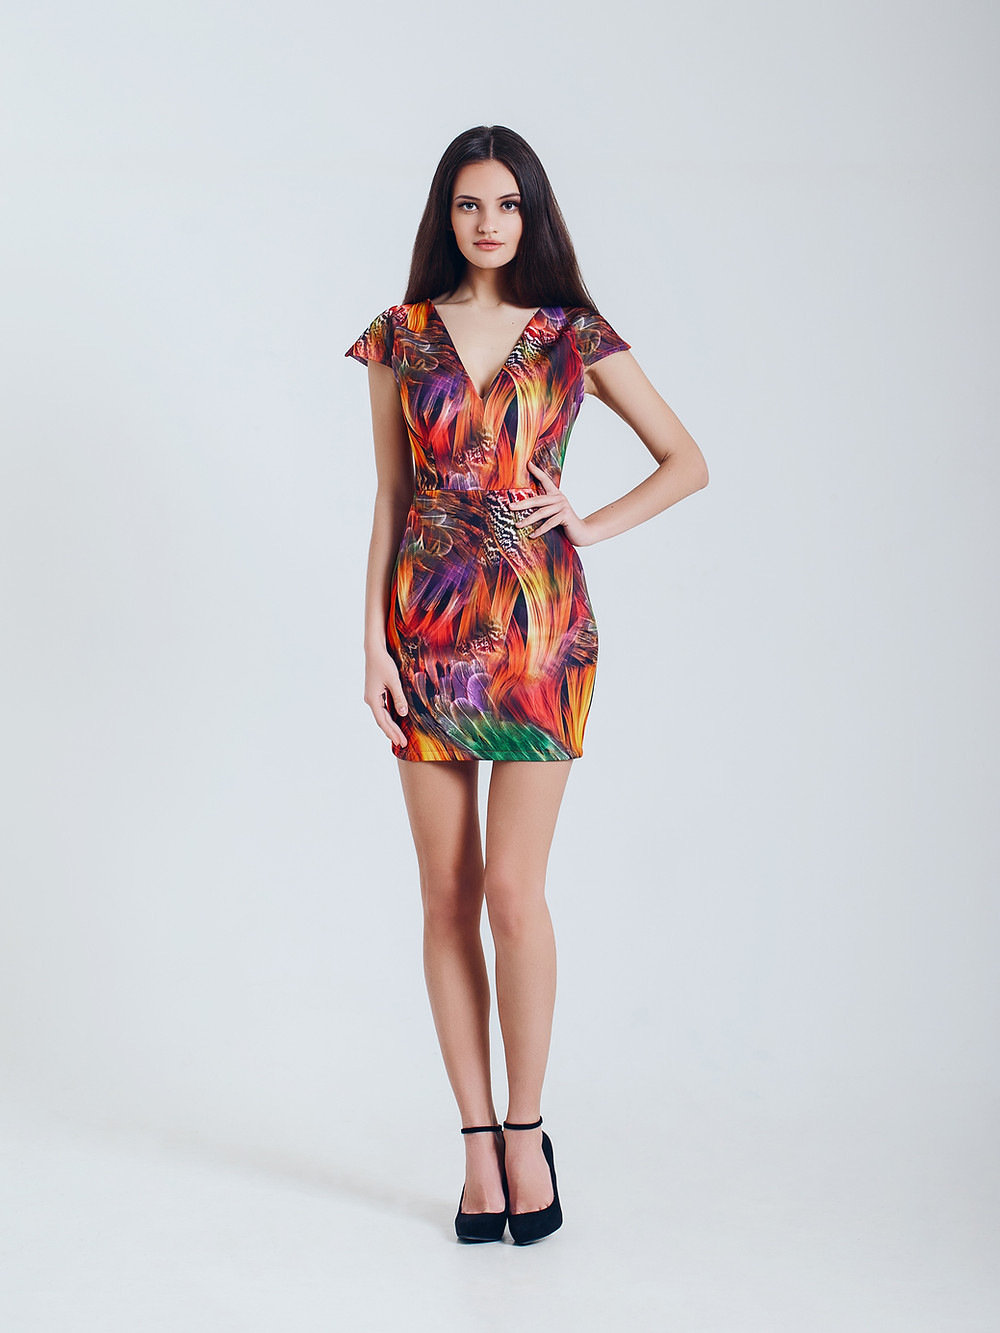 Fashion Model in Tropical Dress